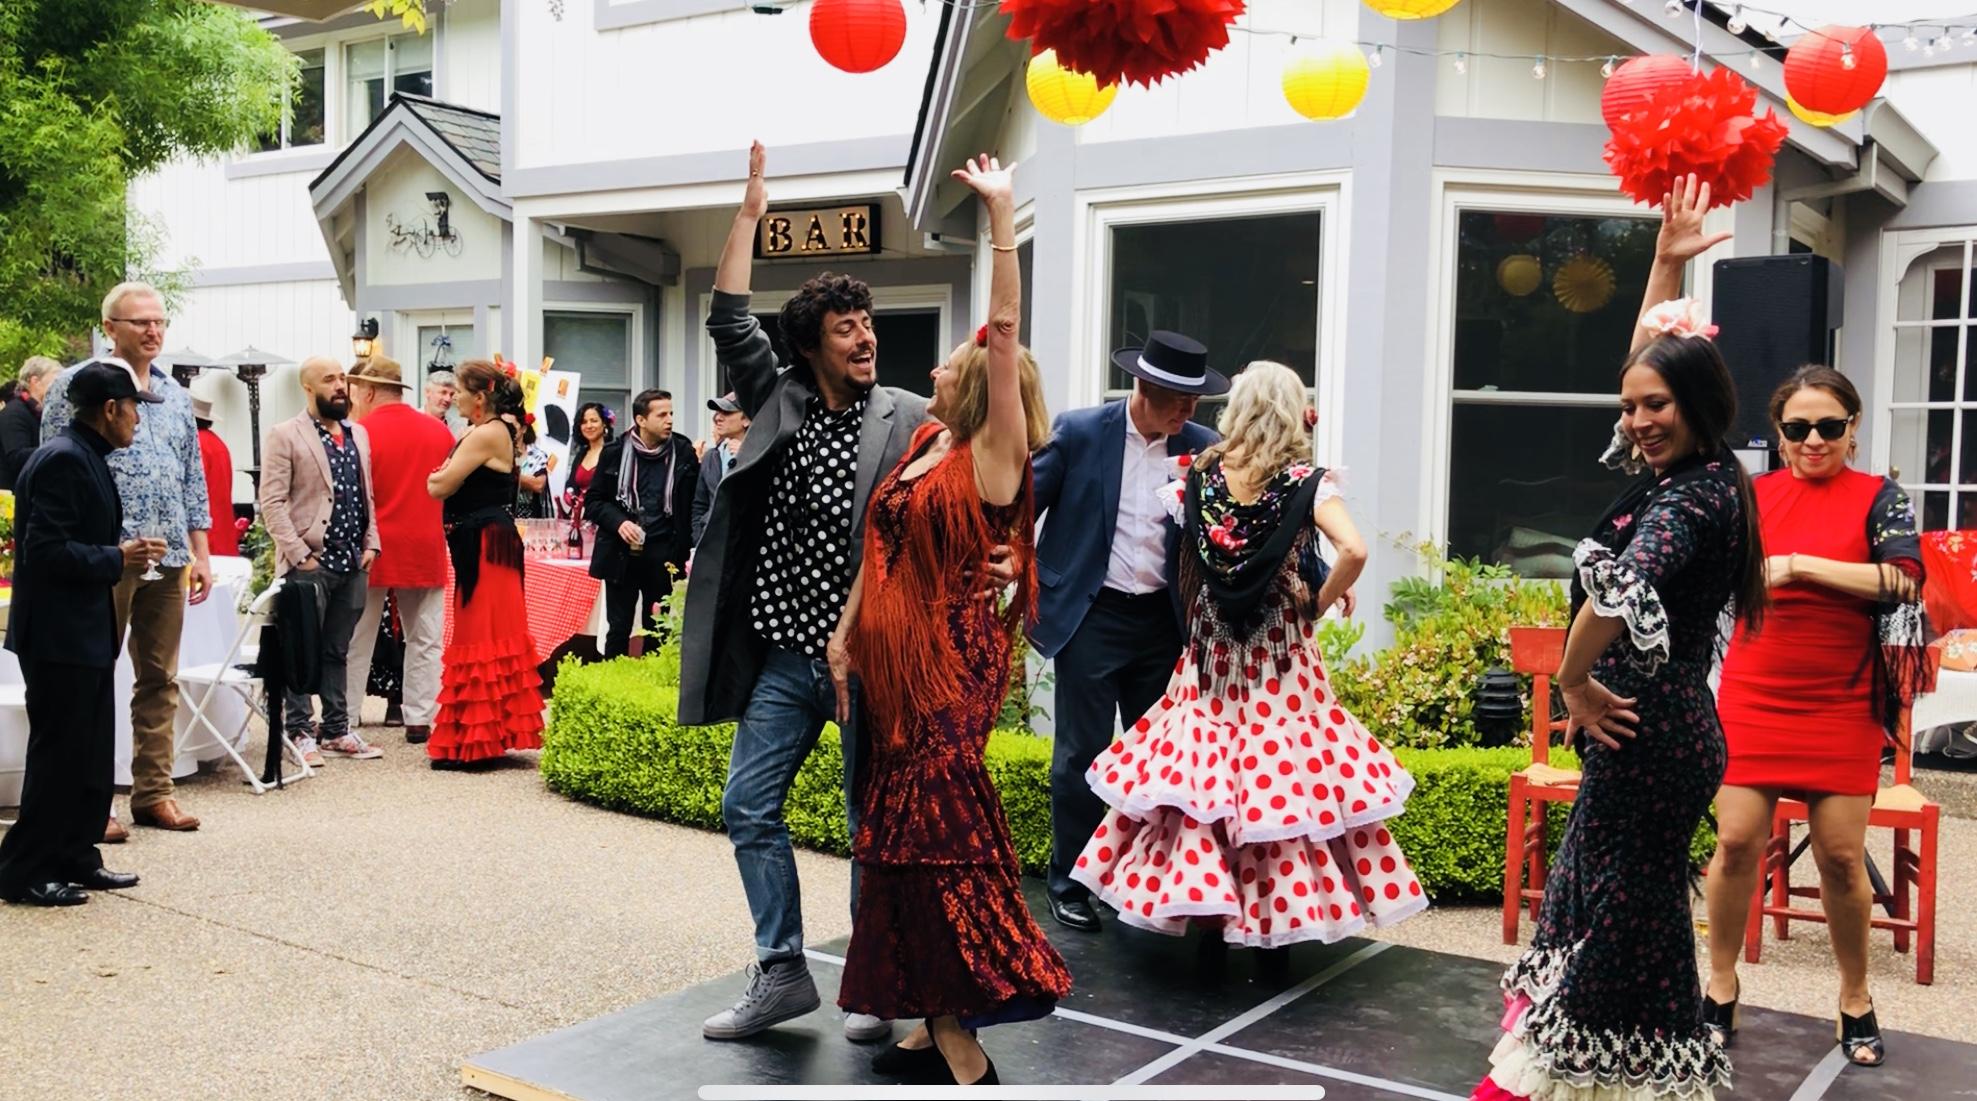 Feria de Abril - Sunday, April 29, 2018